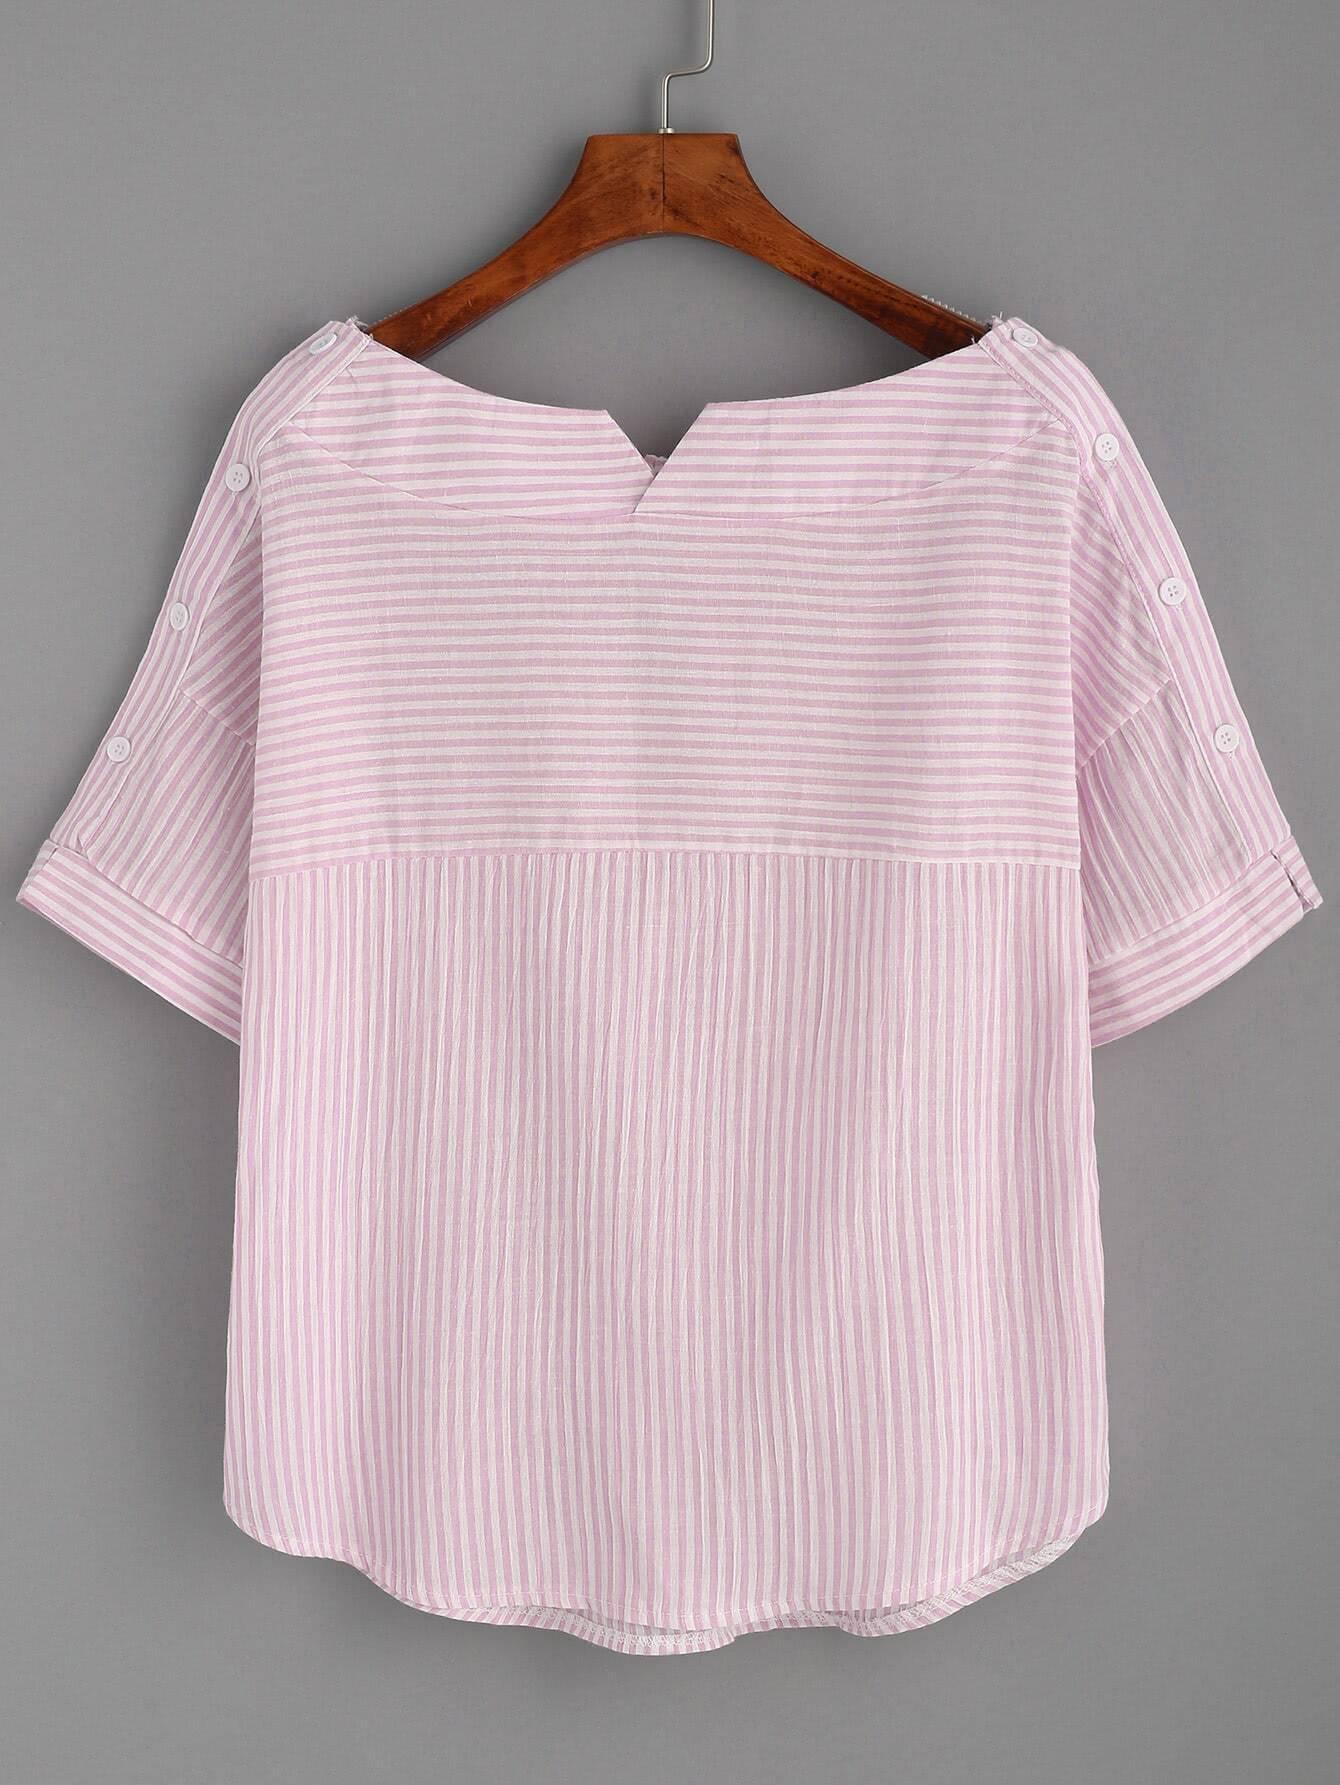 Boat Neckline Pinstripe Button Side Top blouse170619102